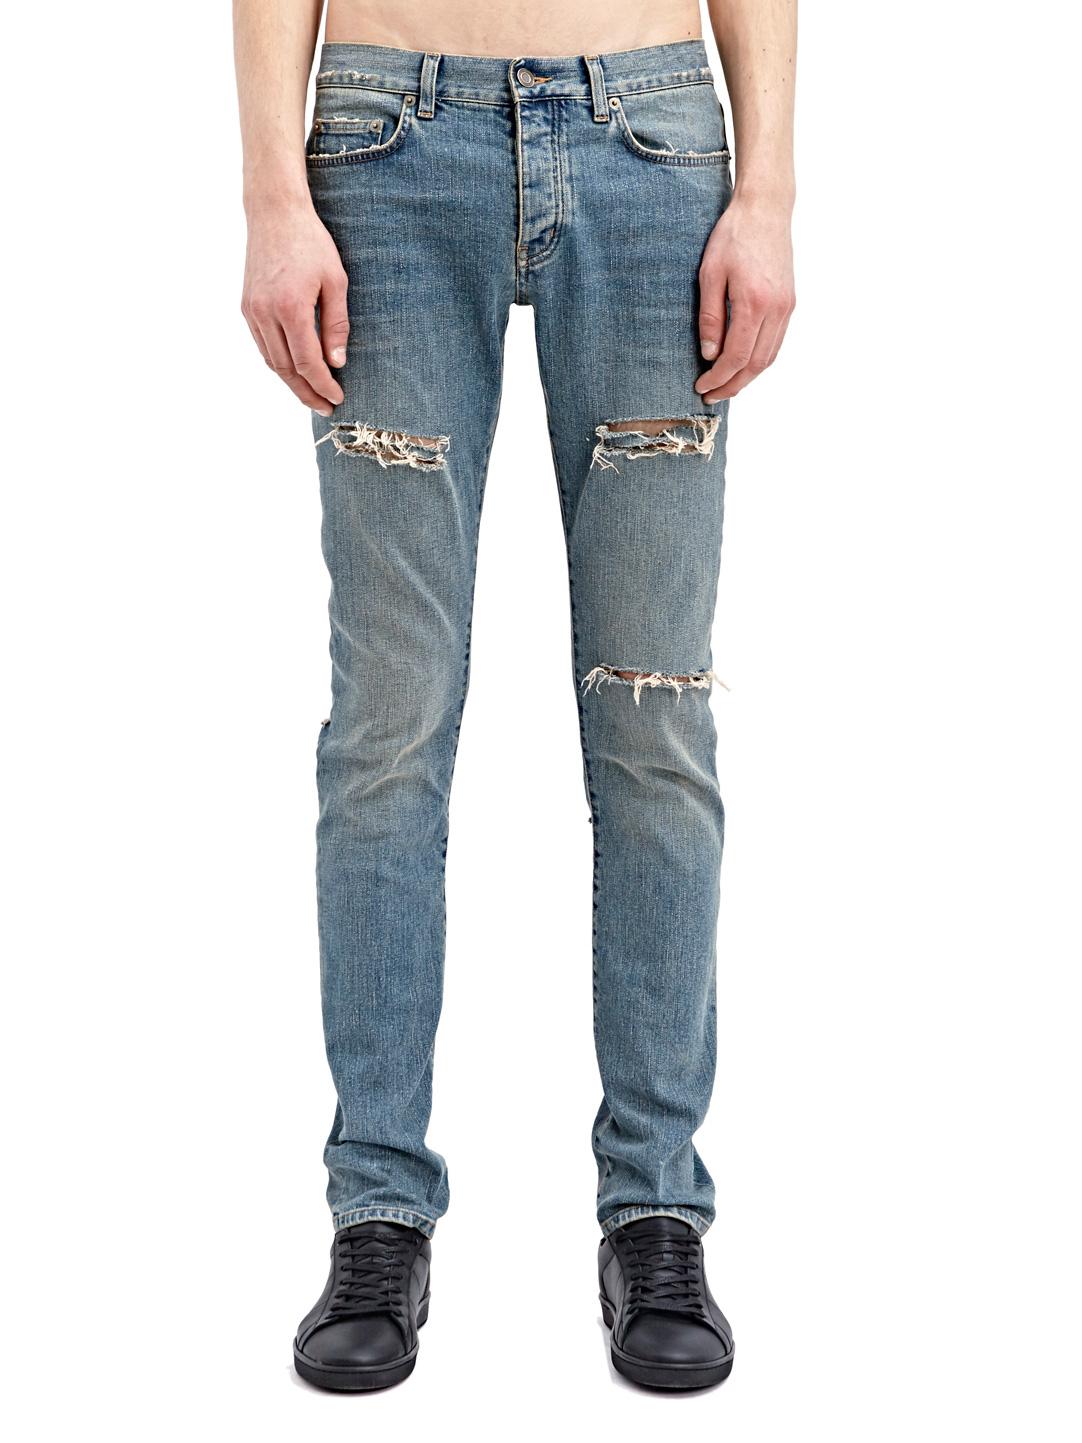 Lyst - Saint Laurent Mens Slim Denim Jeans in Blue for Men - photo#7